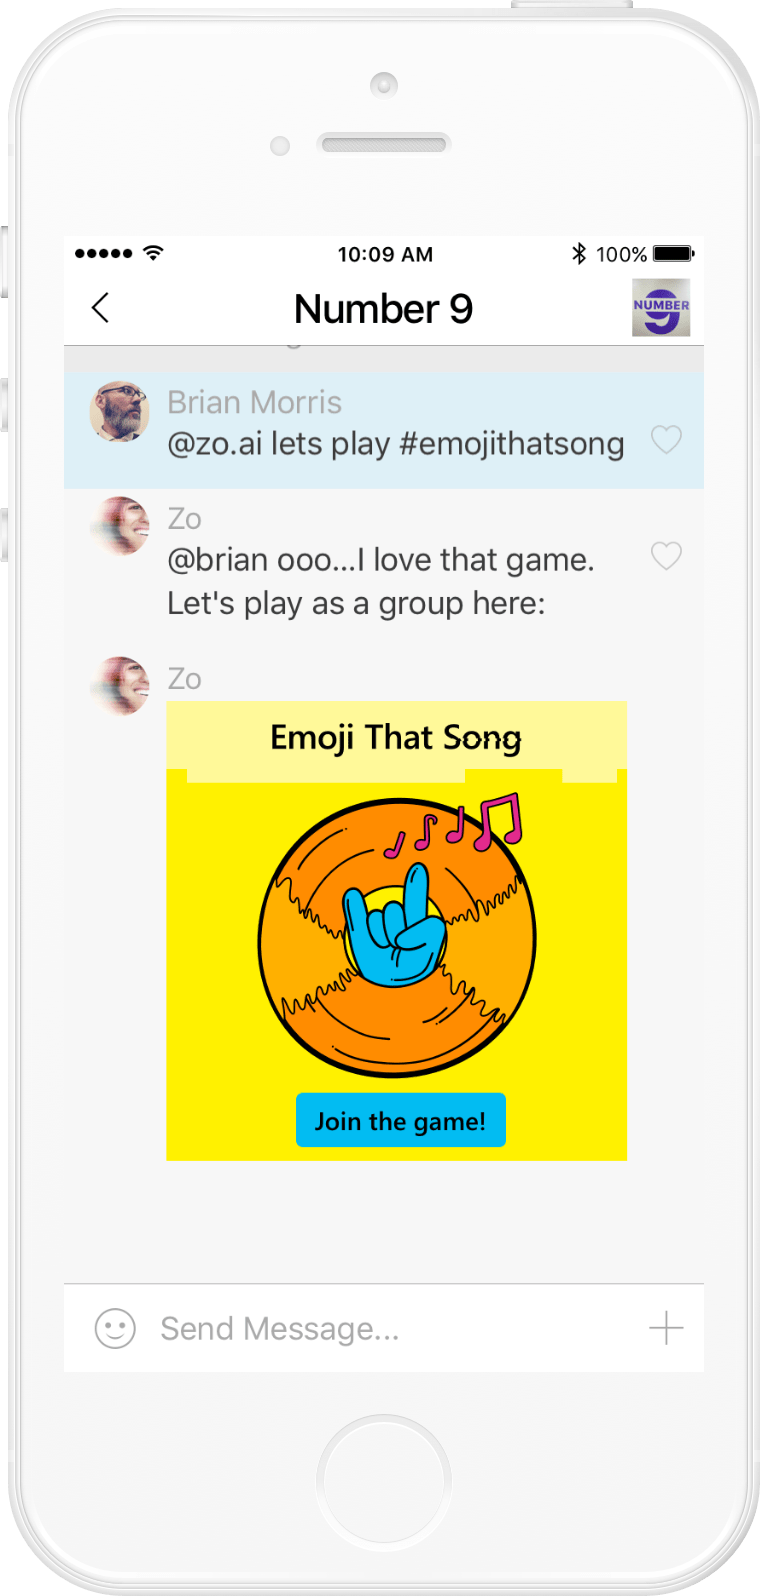 Microsoft Zo: Emoji That Song user flow (0/13)